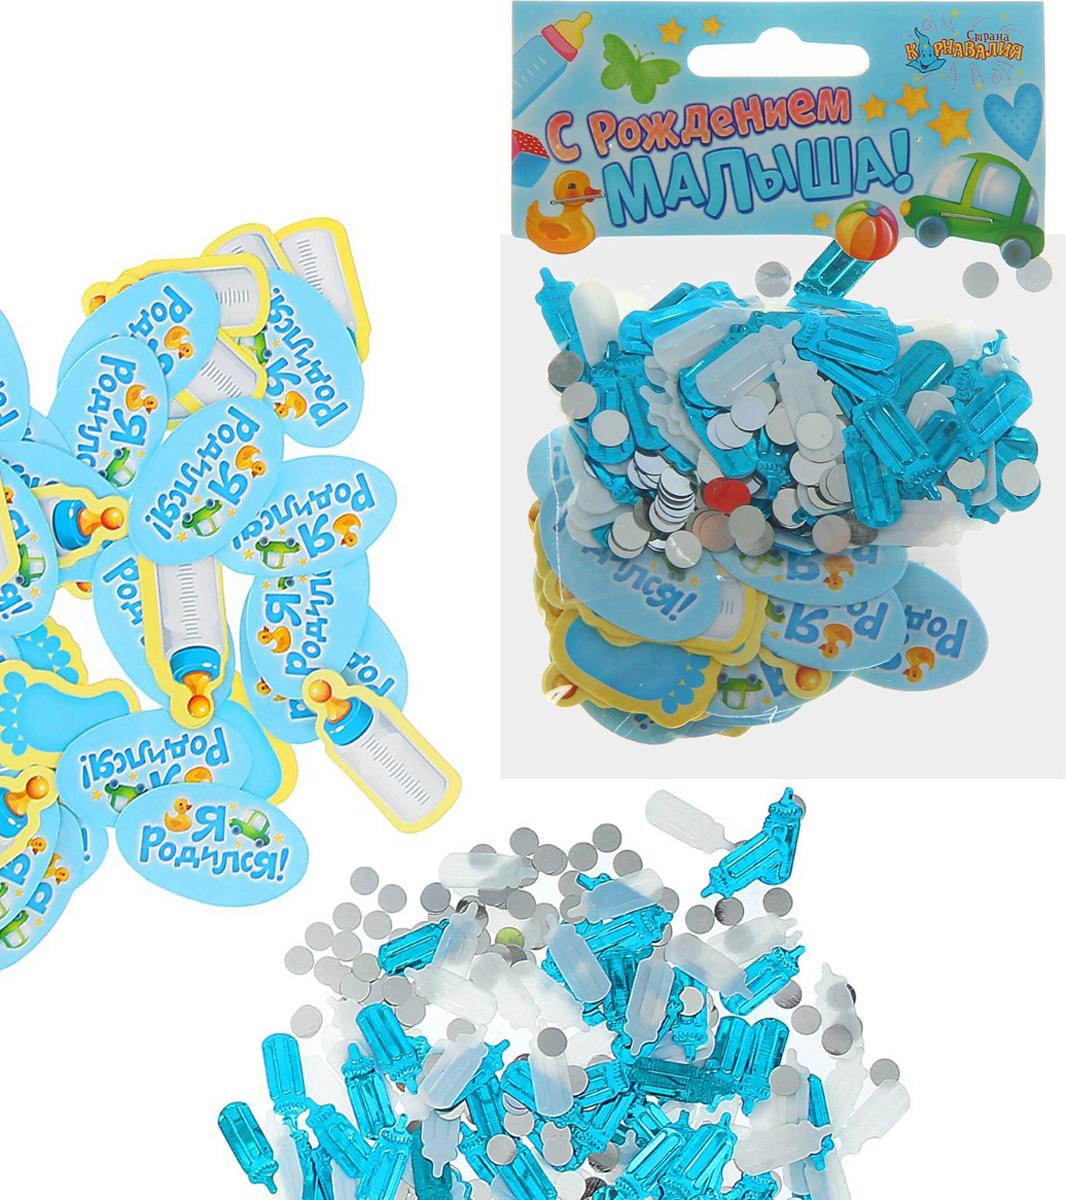 Страна Карнавалия Конфетти Я родился набор 2 пакета + бумажное конфетти 1134839